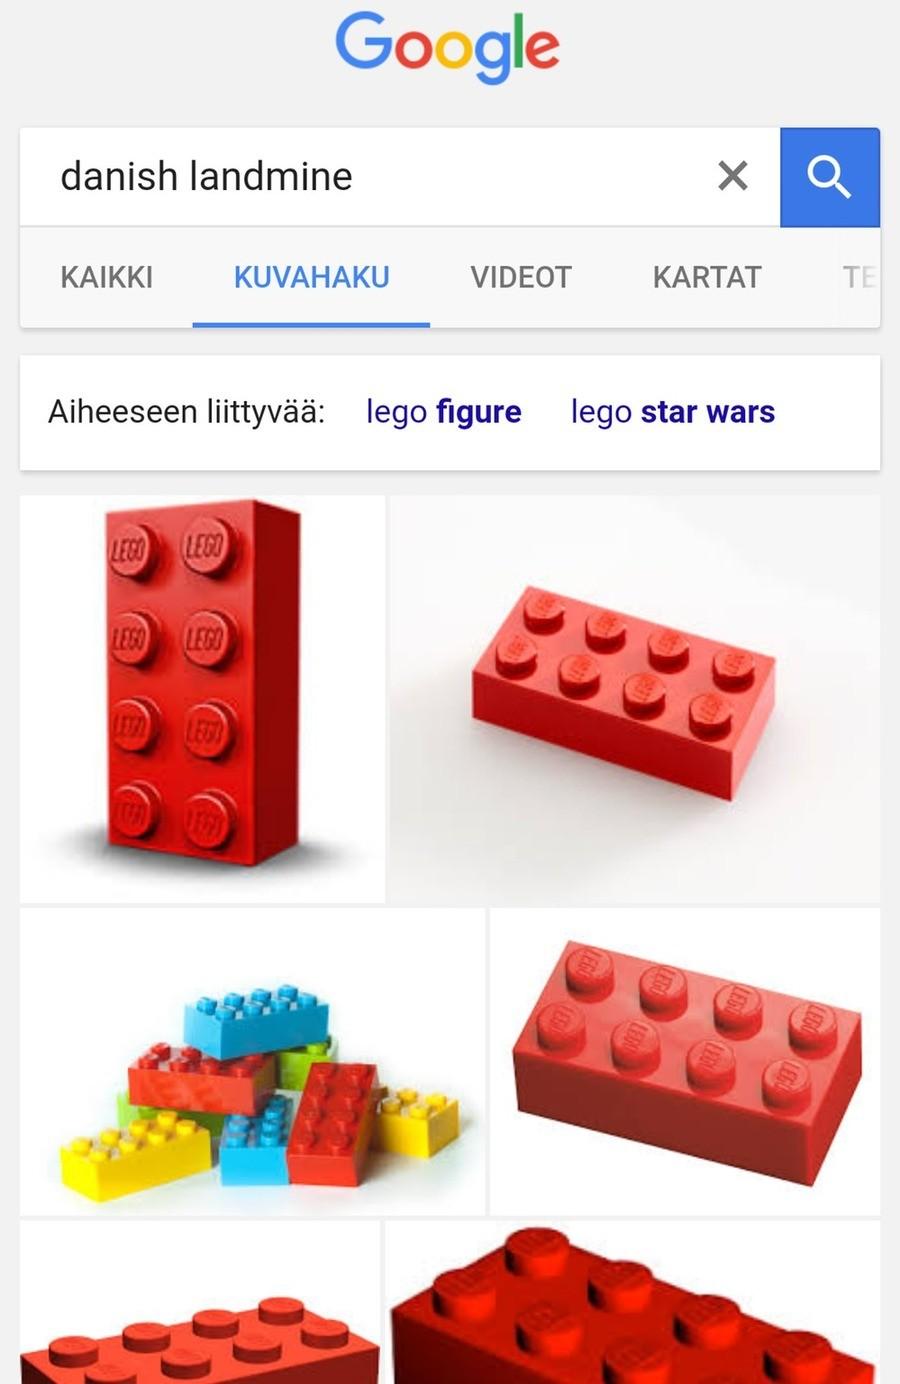 Dank Memes Funnyjunk : Lego dank memes best of the funny meme